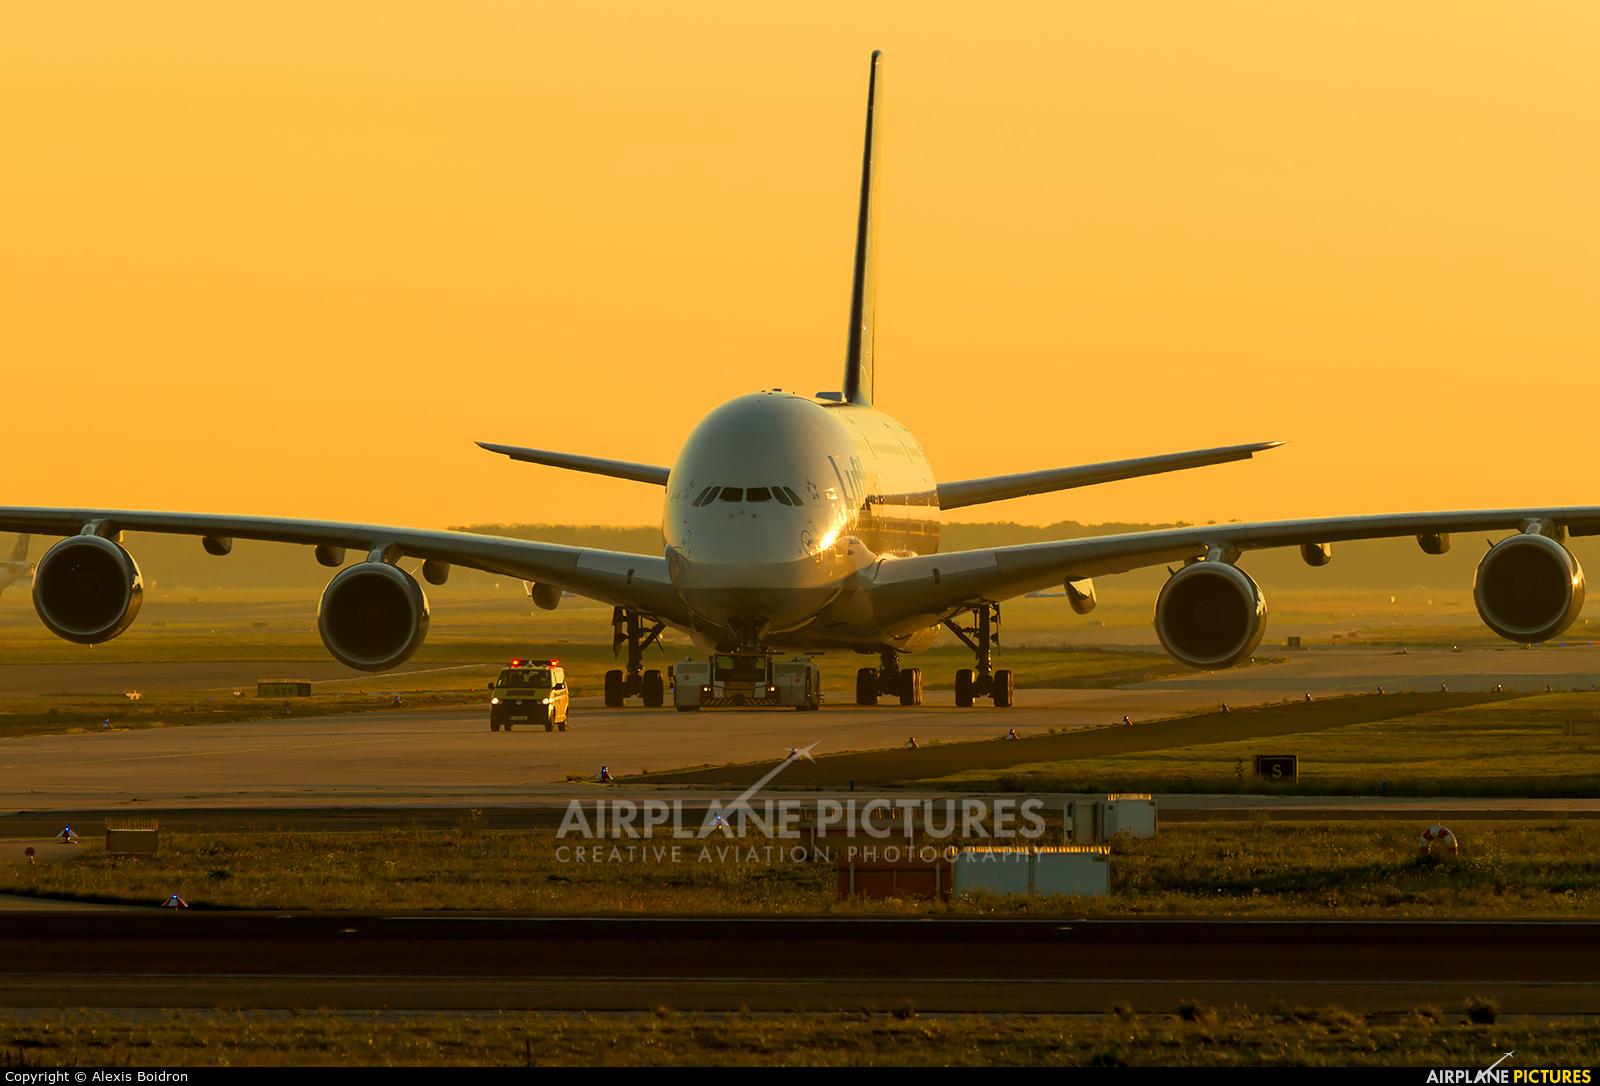 Lufthansa D-AIMB aircraft at Frankfurt